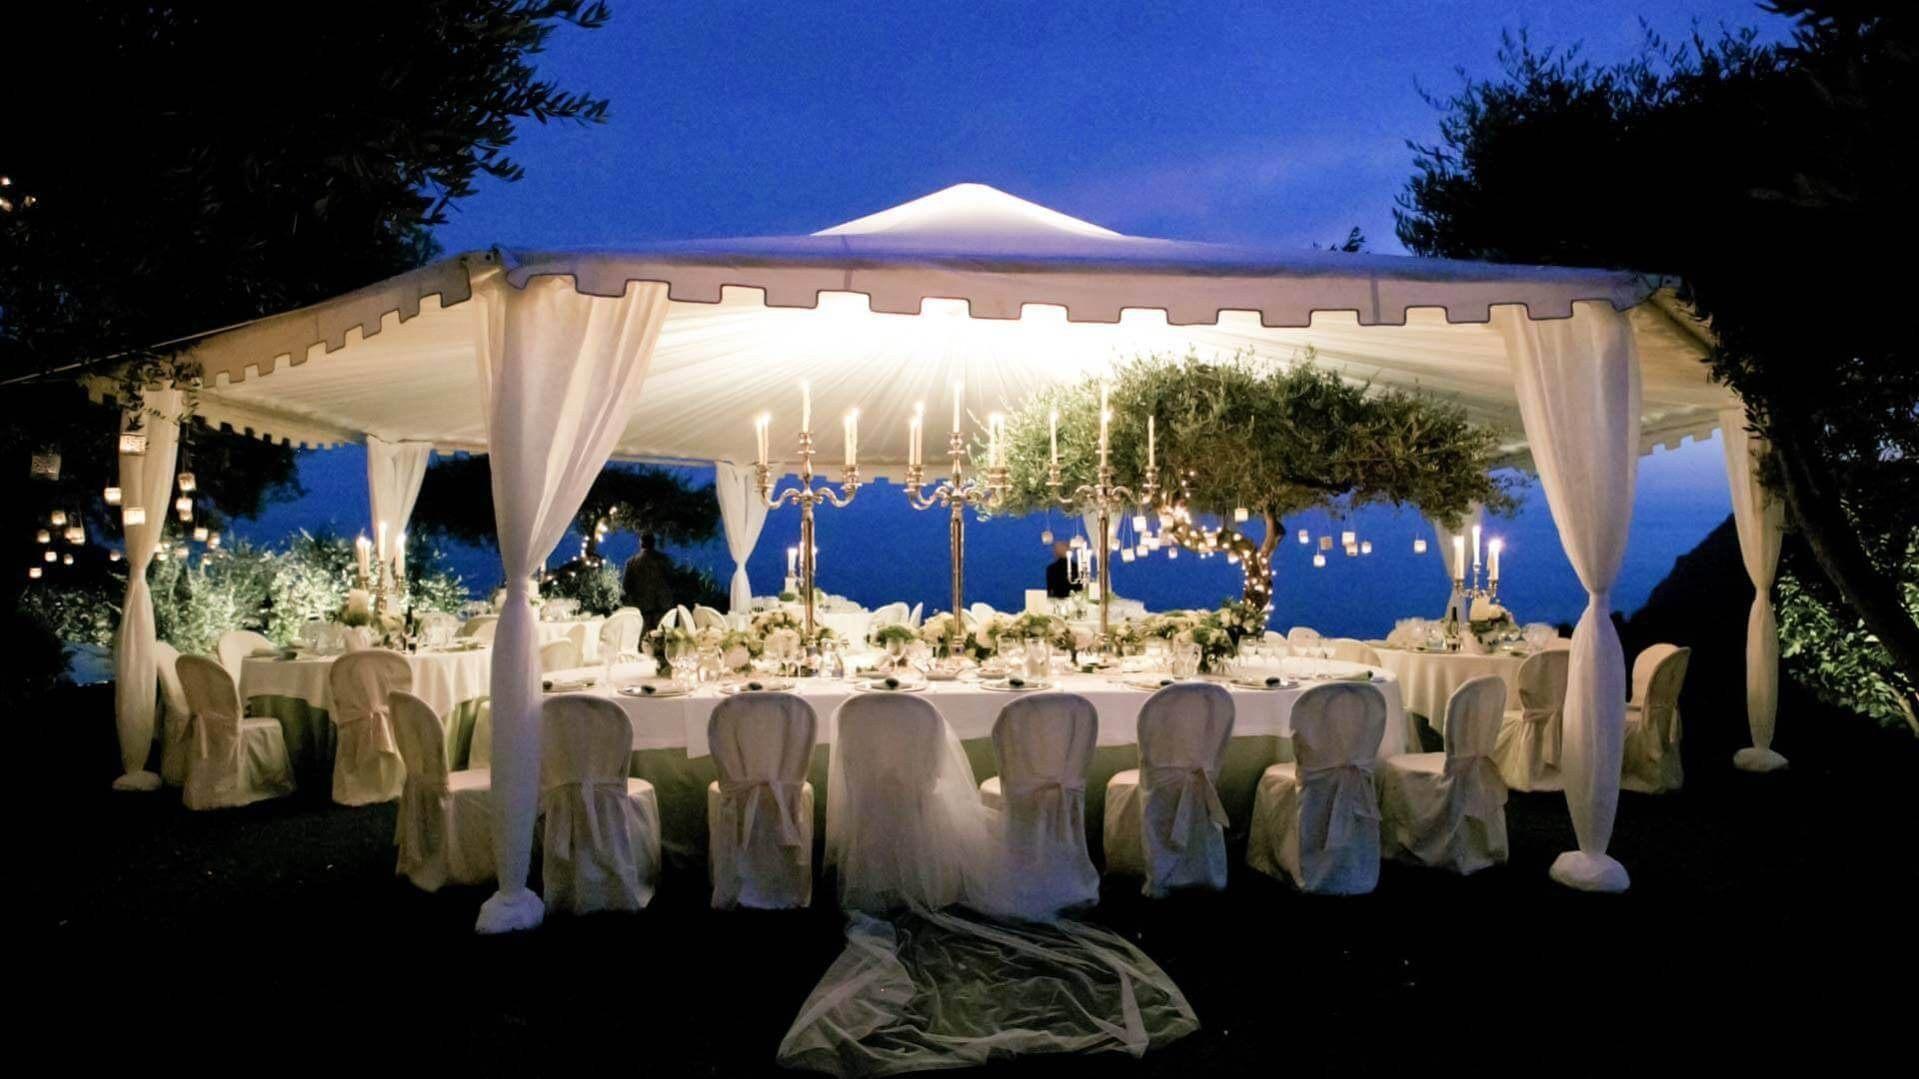 Matrimonio Spiaggia Liguria : Home ⋆ capurro ricevimenti